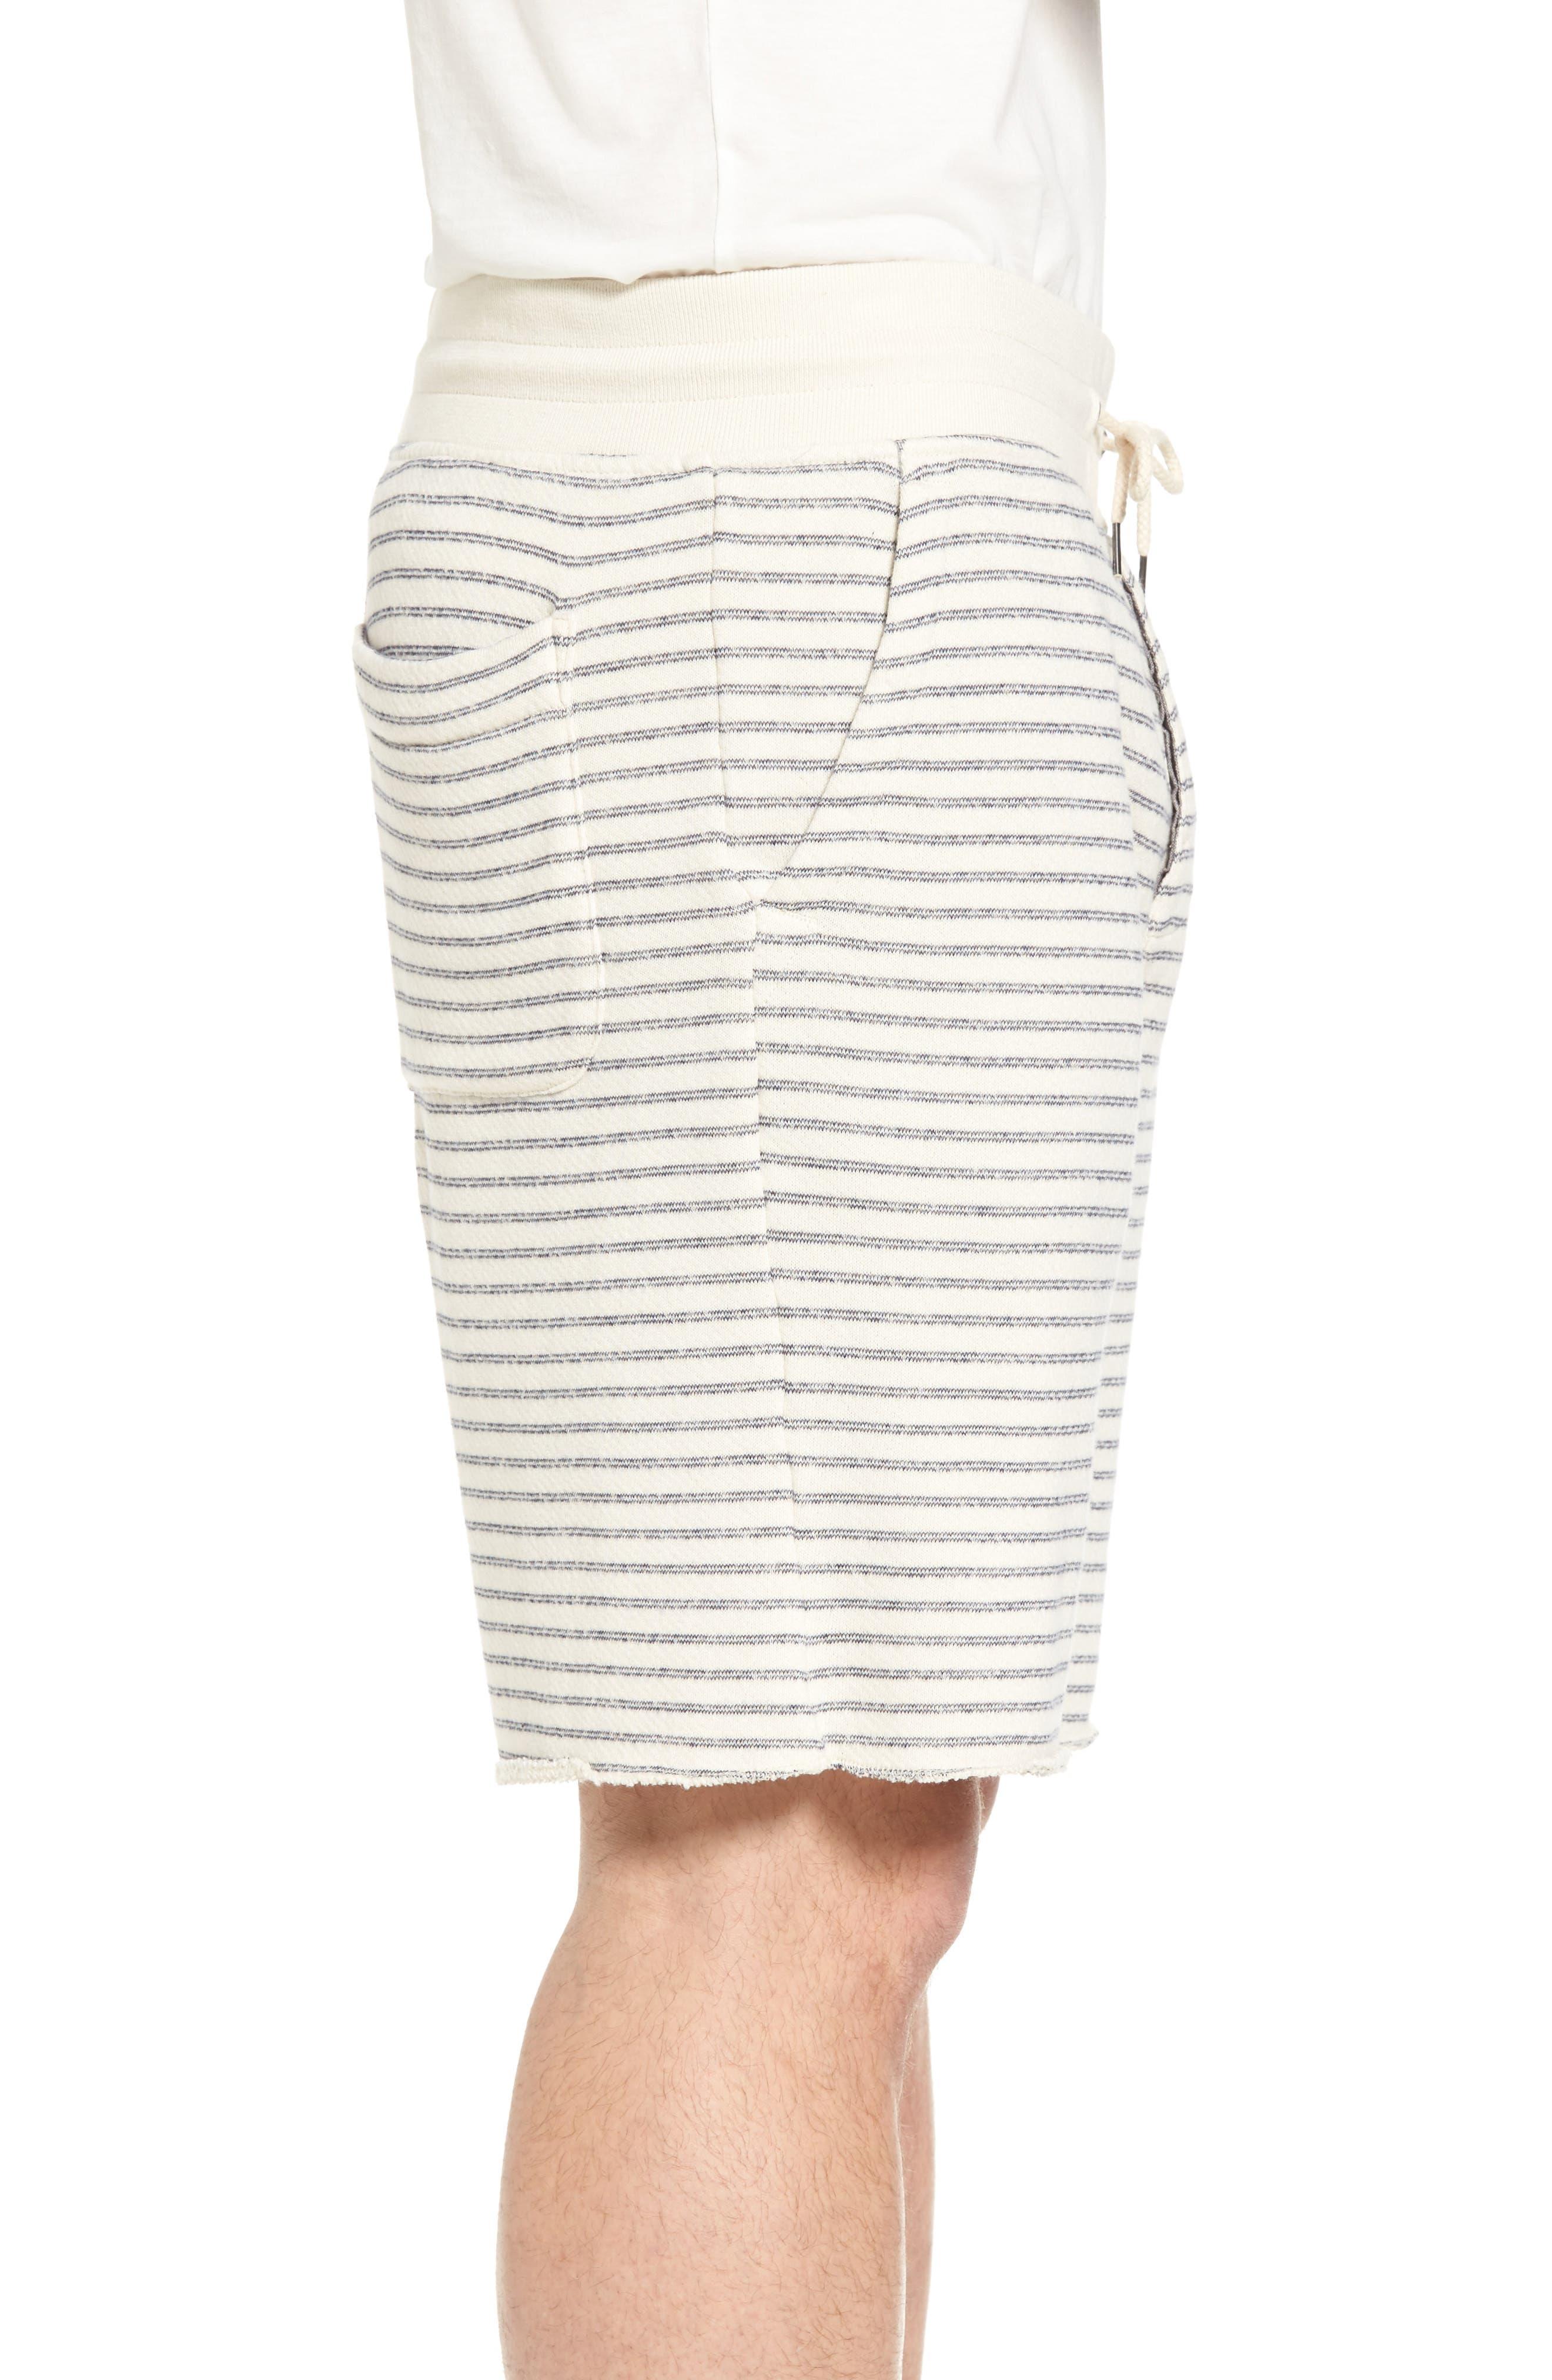 Dalton Stripe Drawcord Terry Shorts,                             Alternate thumbnail 3, color,                             White/ Navy Stripe